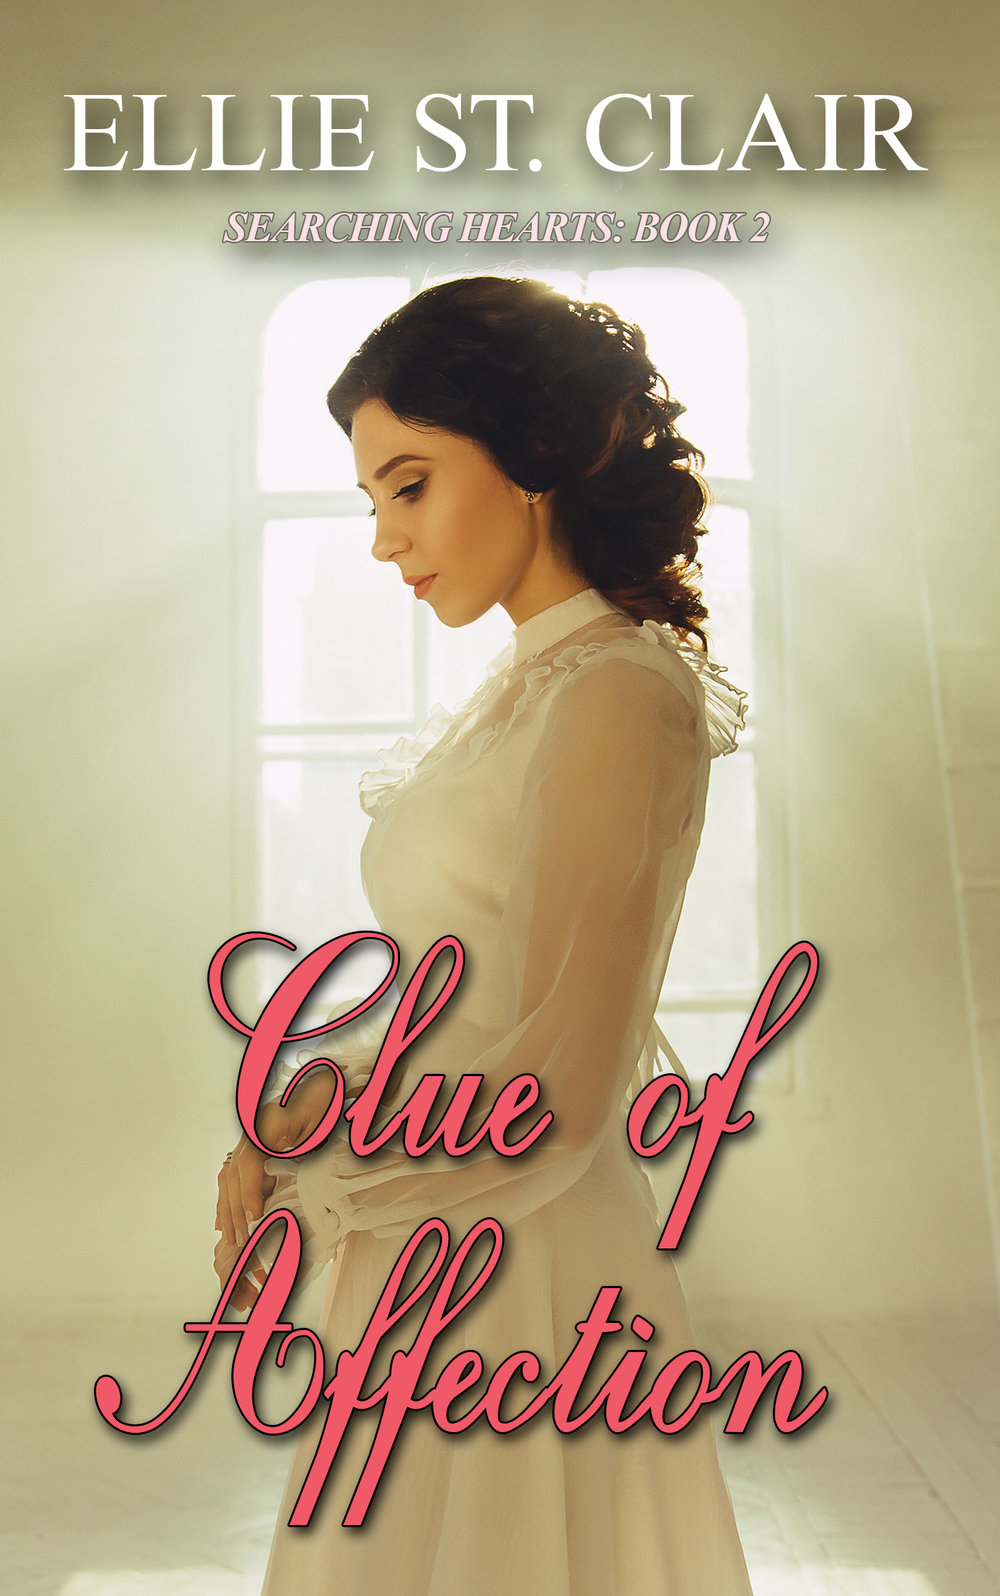 clue-of-affection.jpg